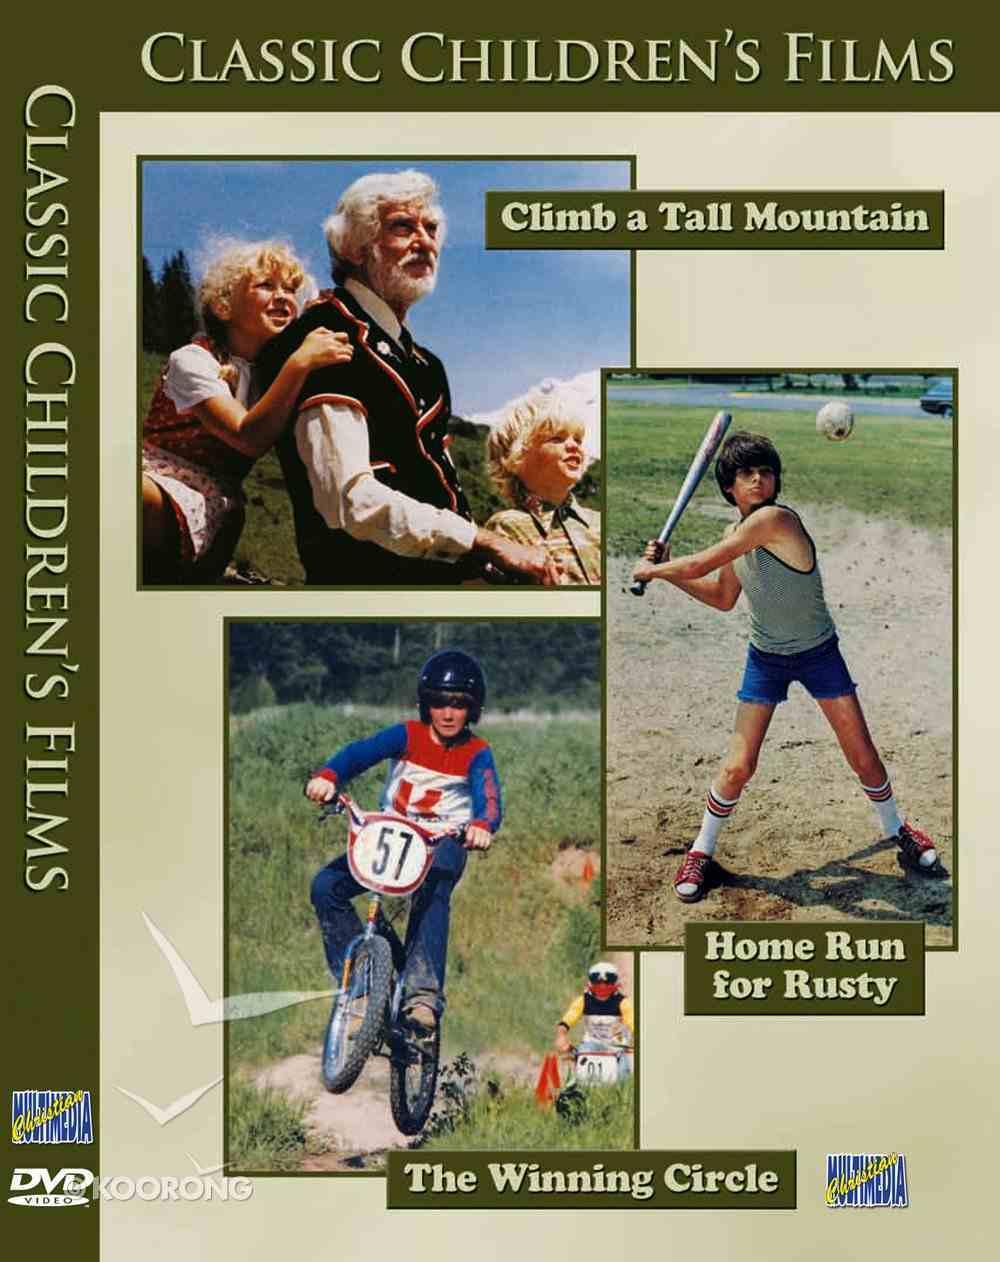 Classic Children's Films DVD